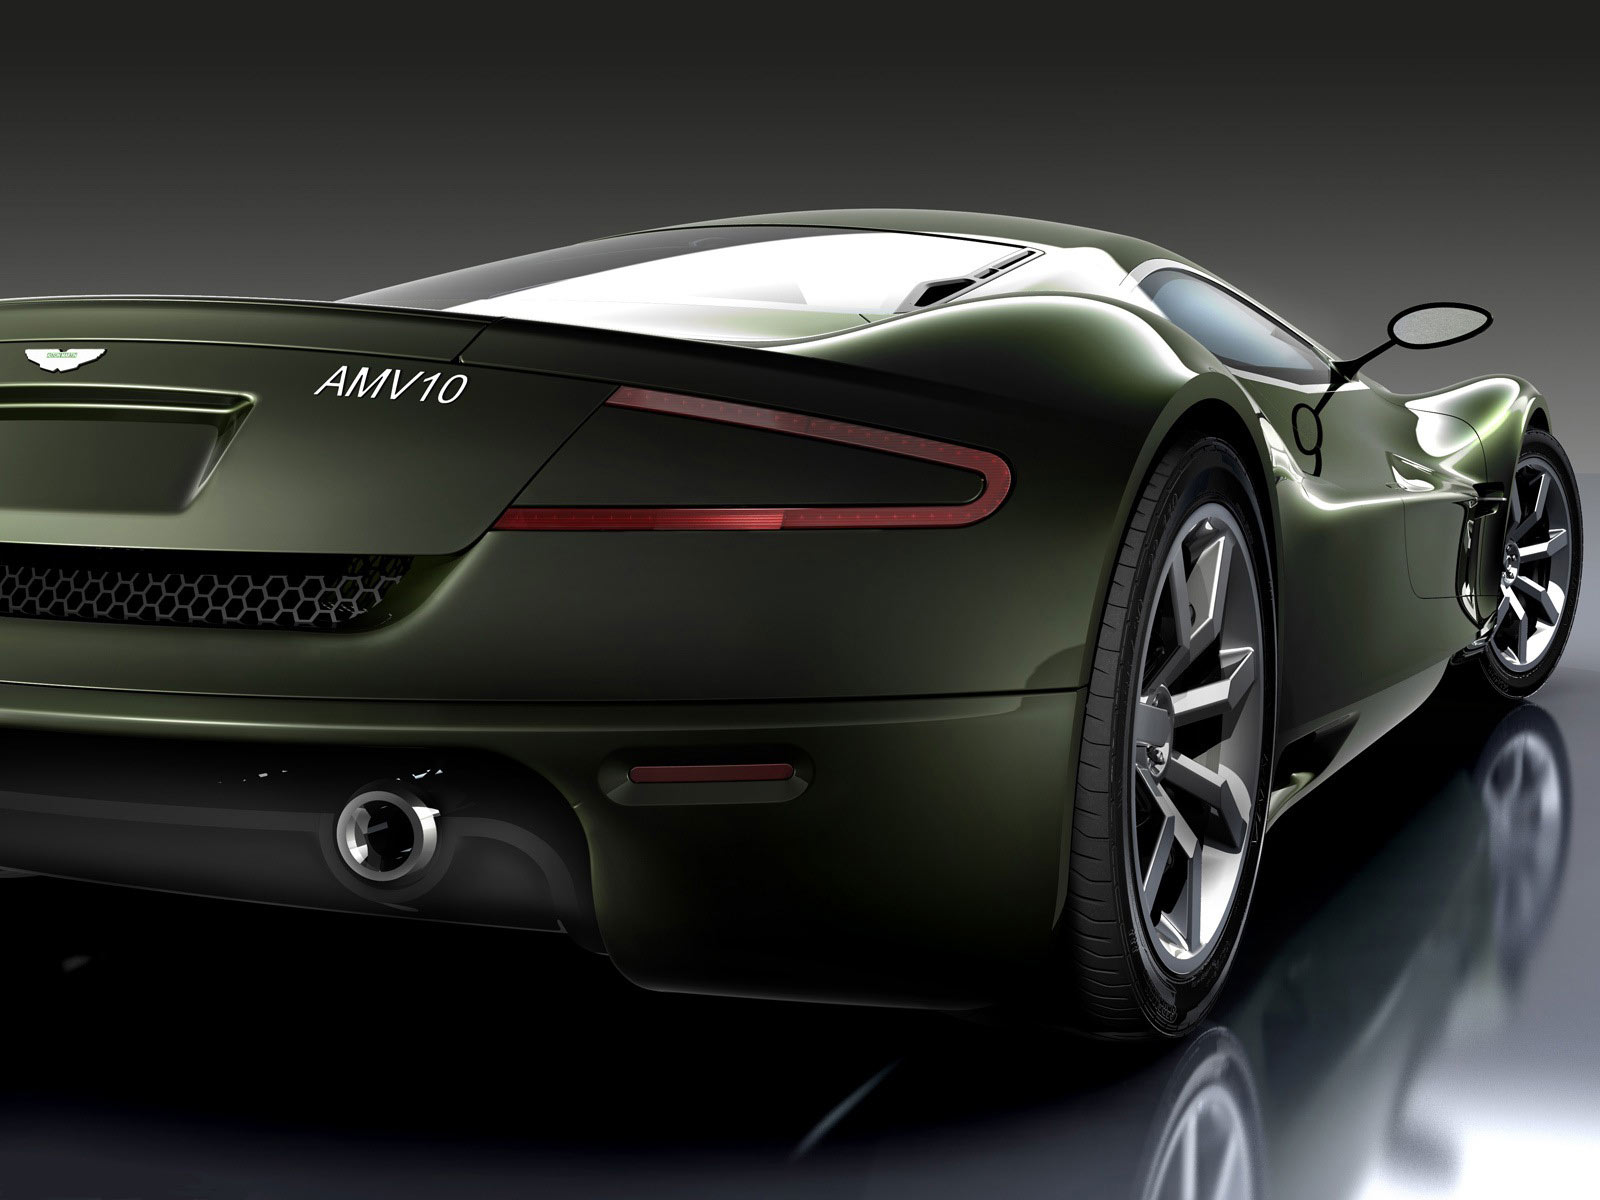 77] Sports Car Desktop Backgrounds on WallpaperSafari 1600x1200